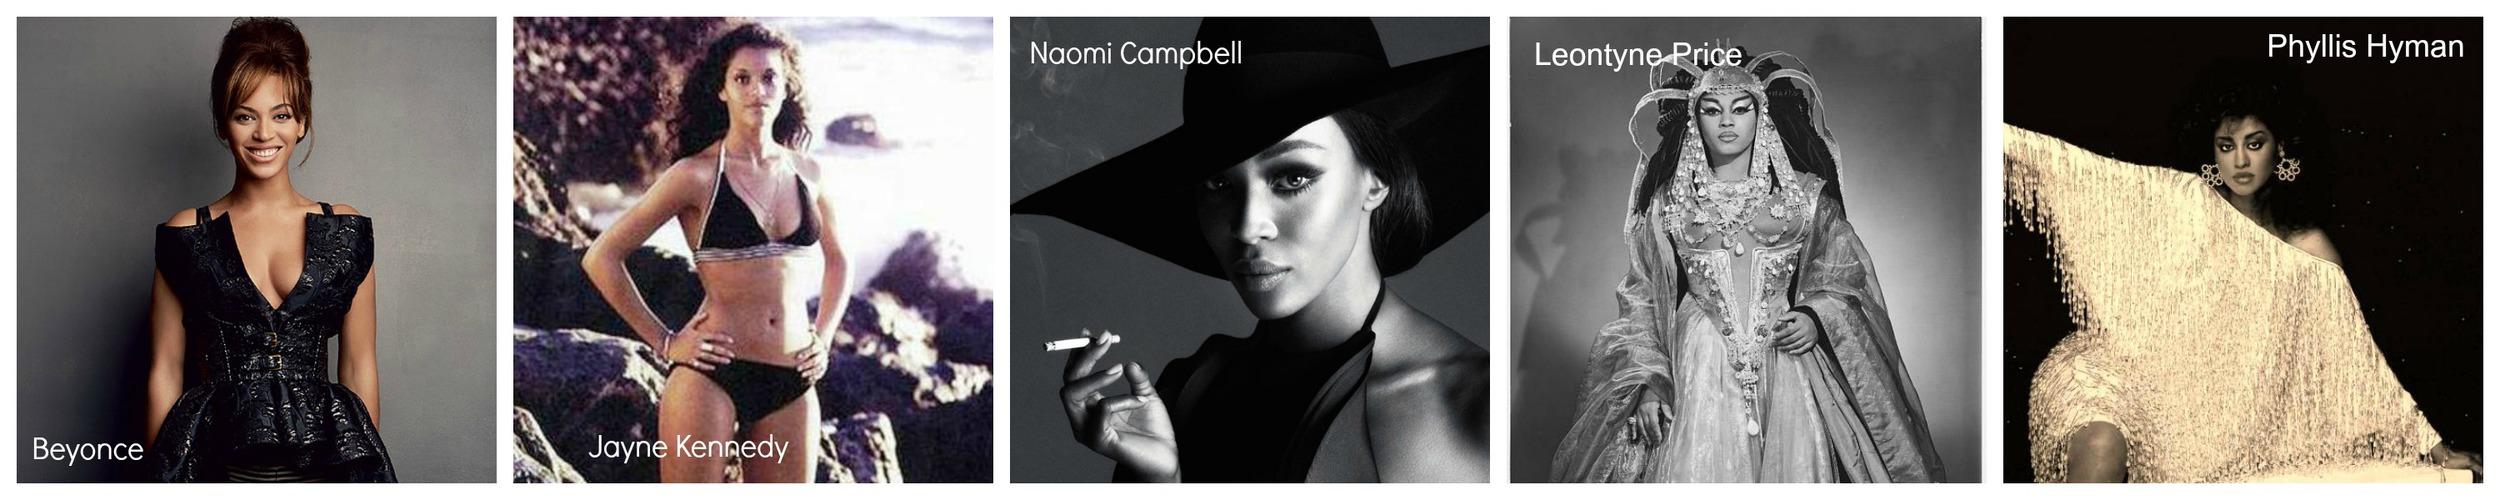 Black Fashion Icons Classy Black Girl Black History Month Beyonce Jayne Kennedy Naomi campbell Leontyne Price Phyllis Hyman